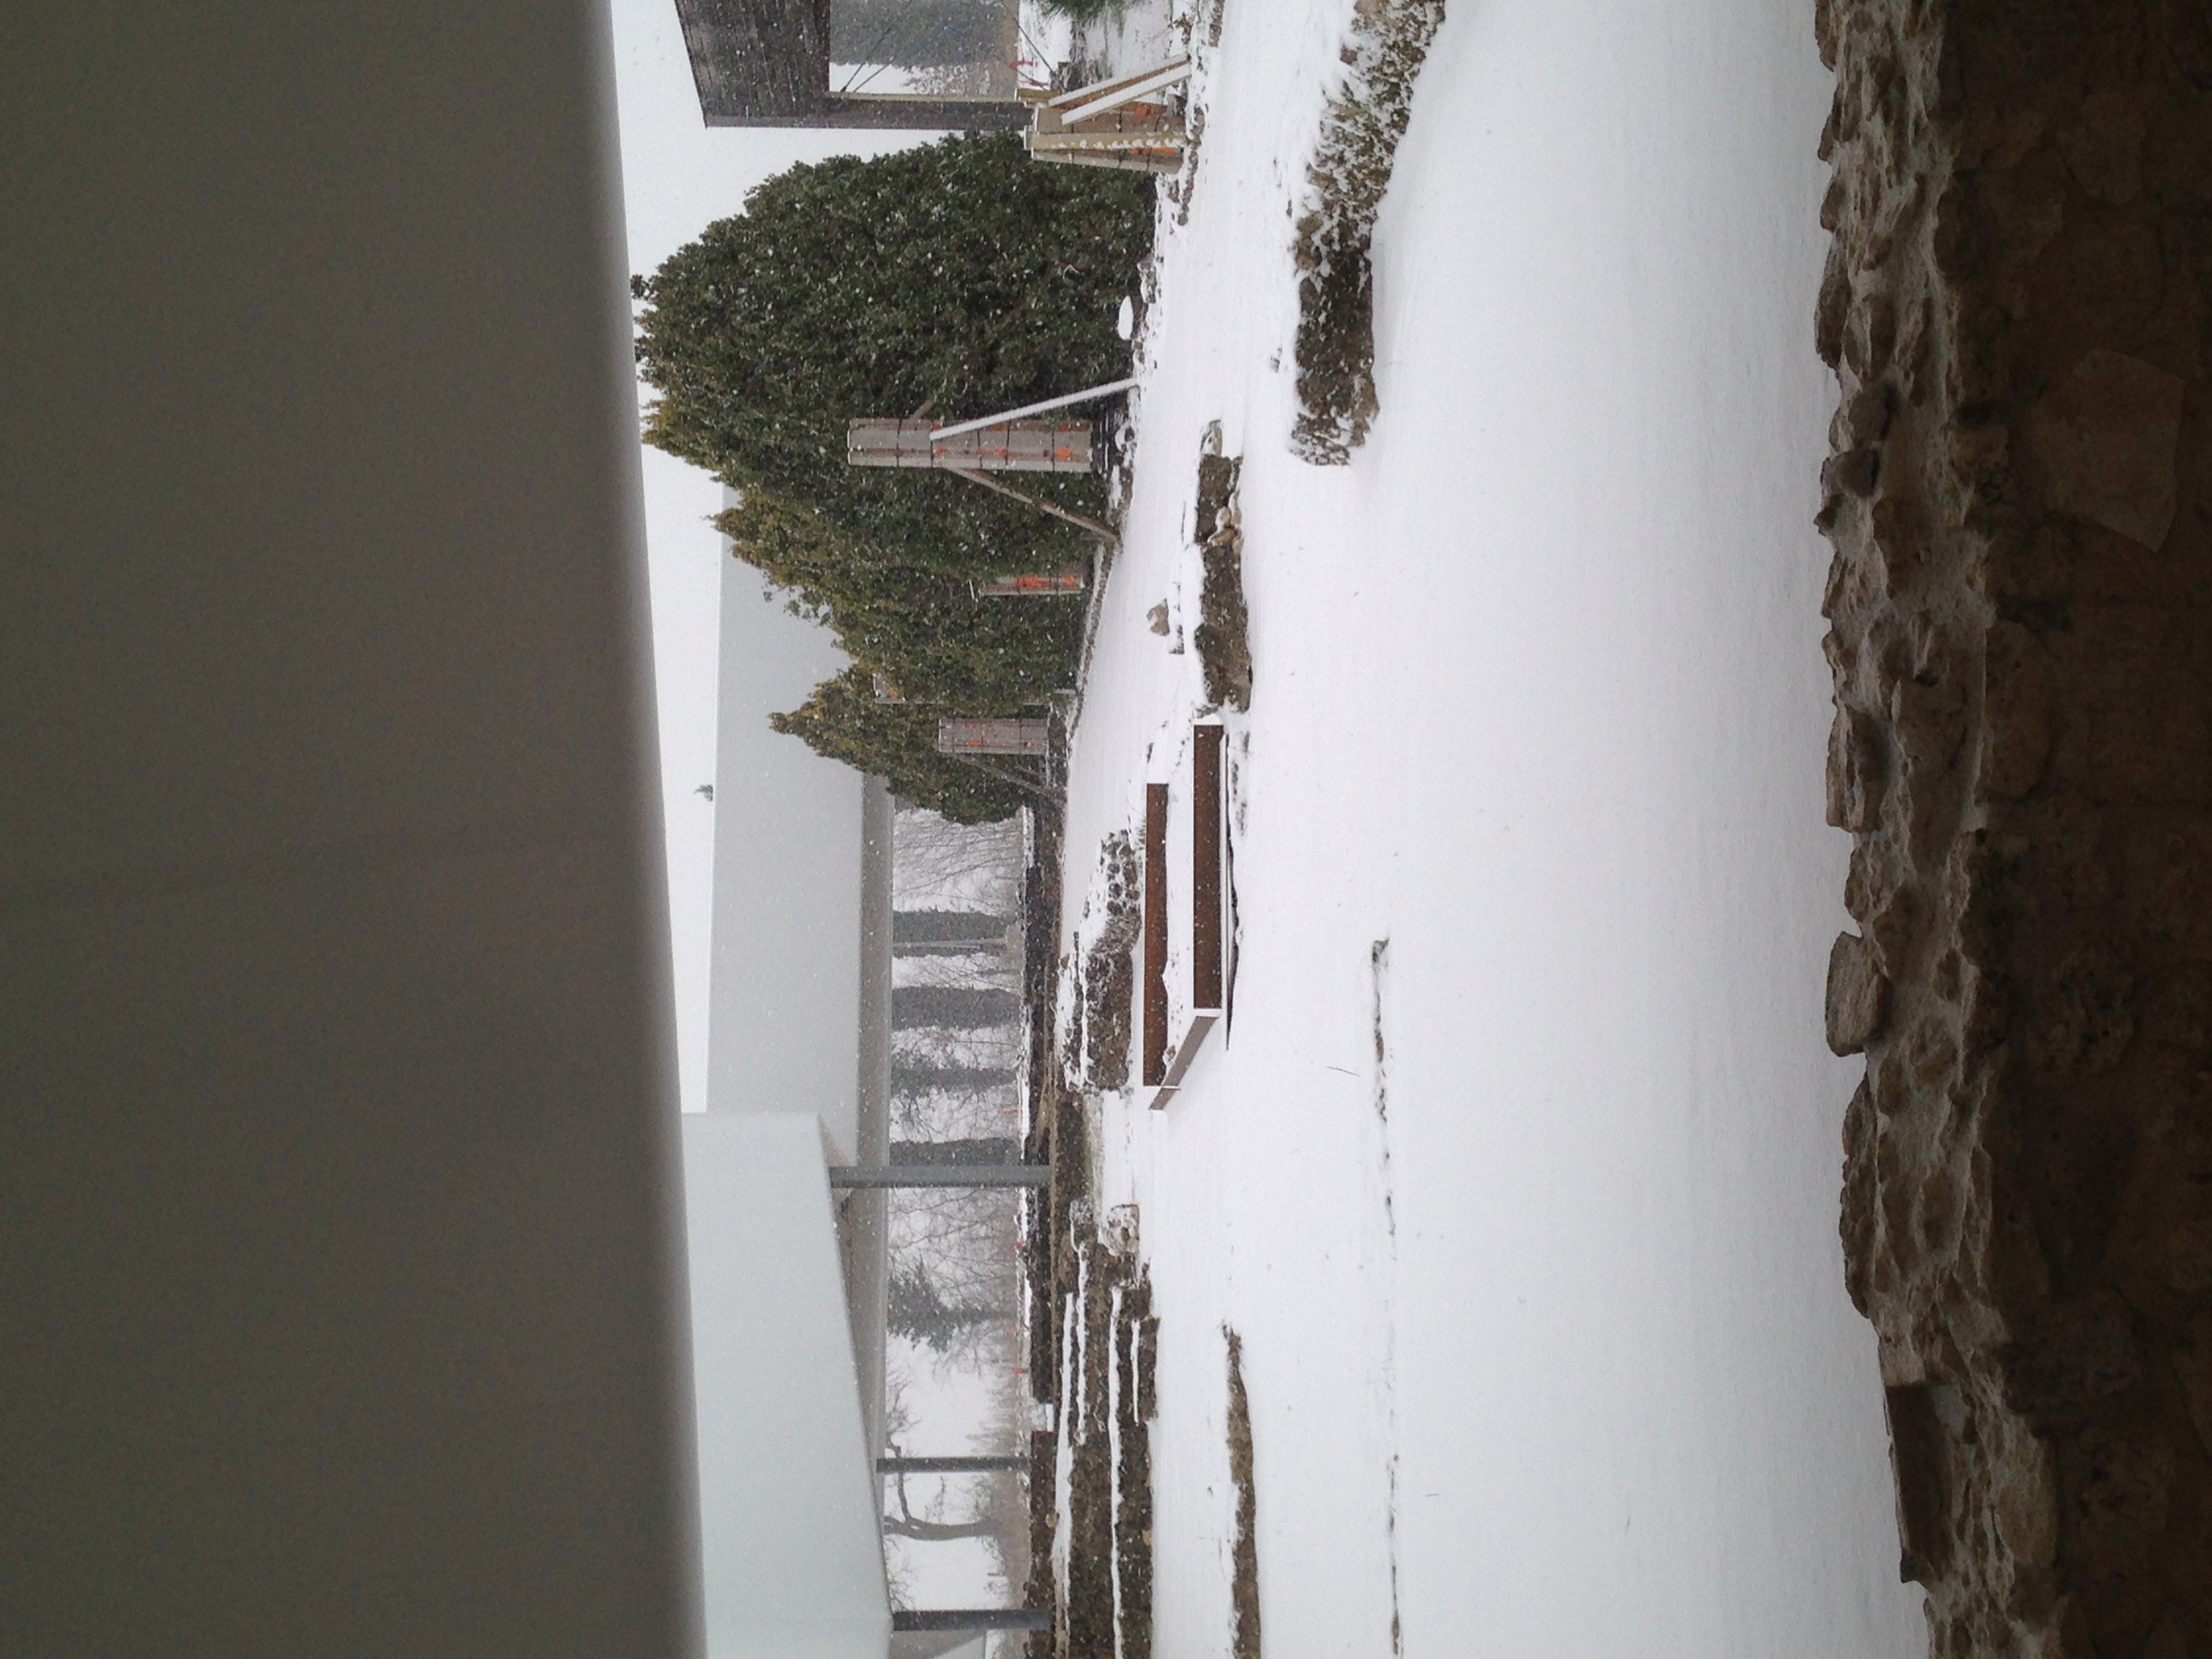 Seviac hiver 2016/2017